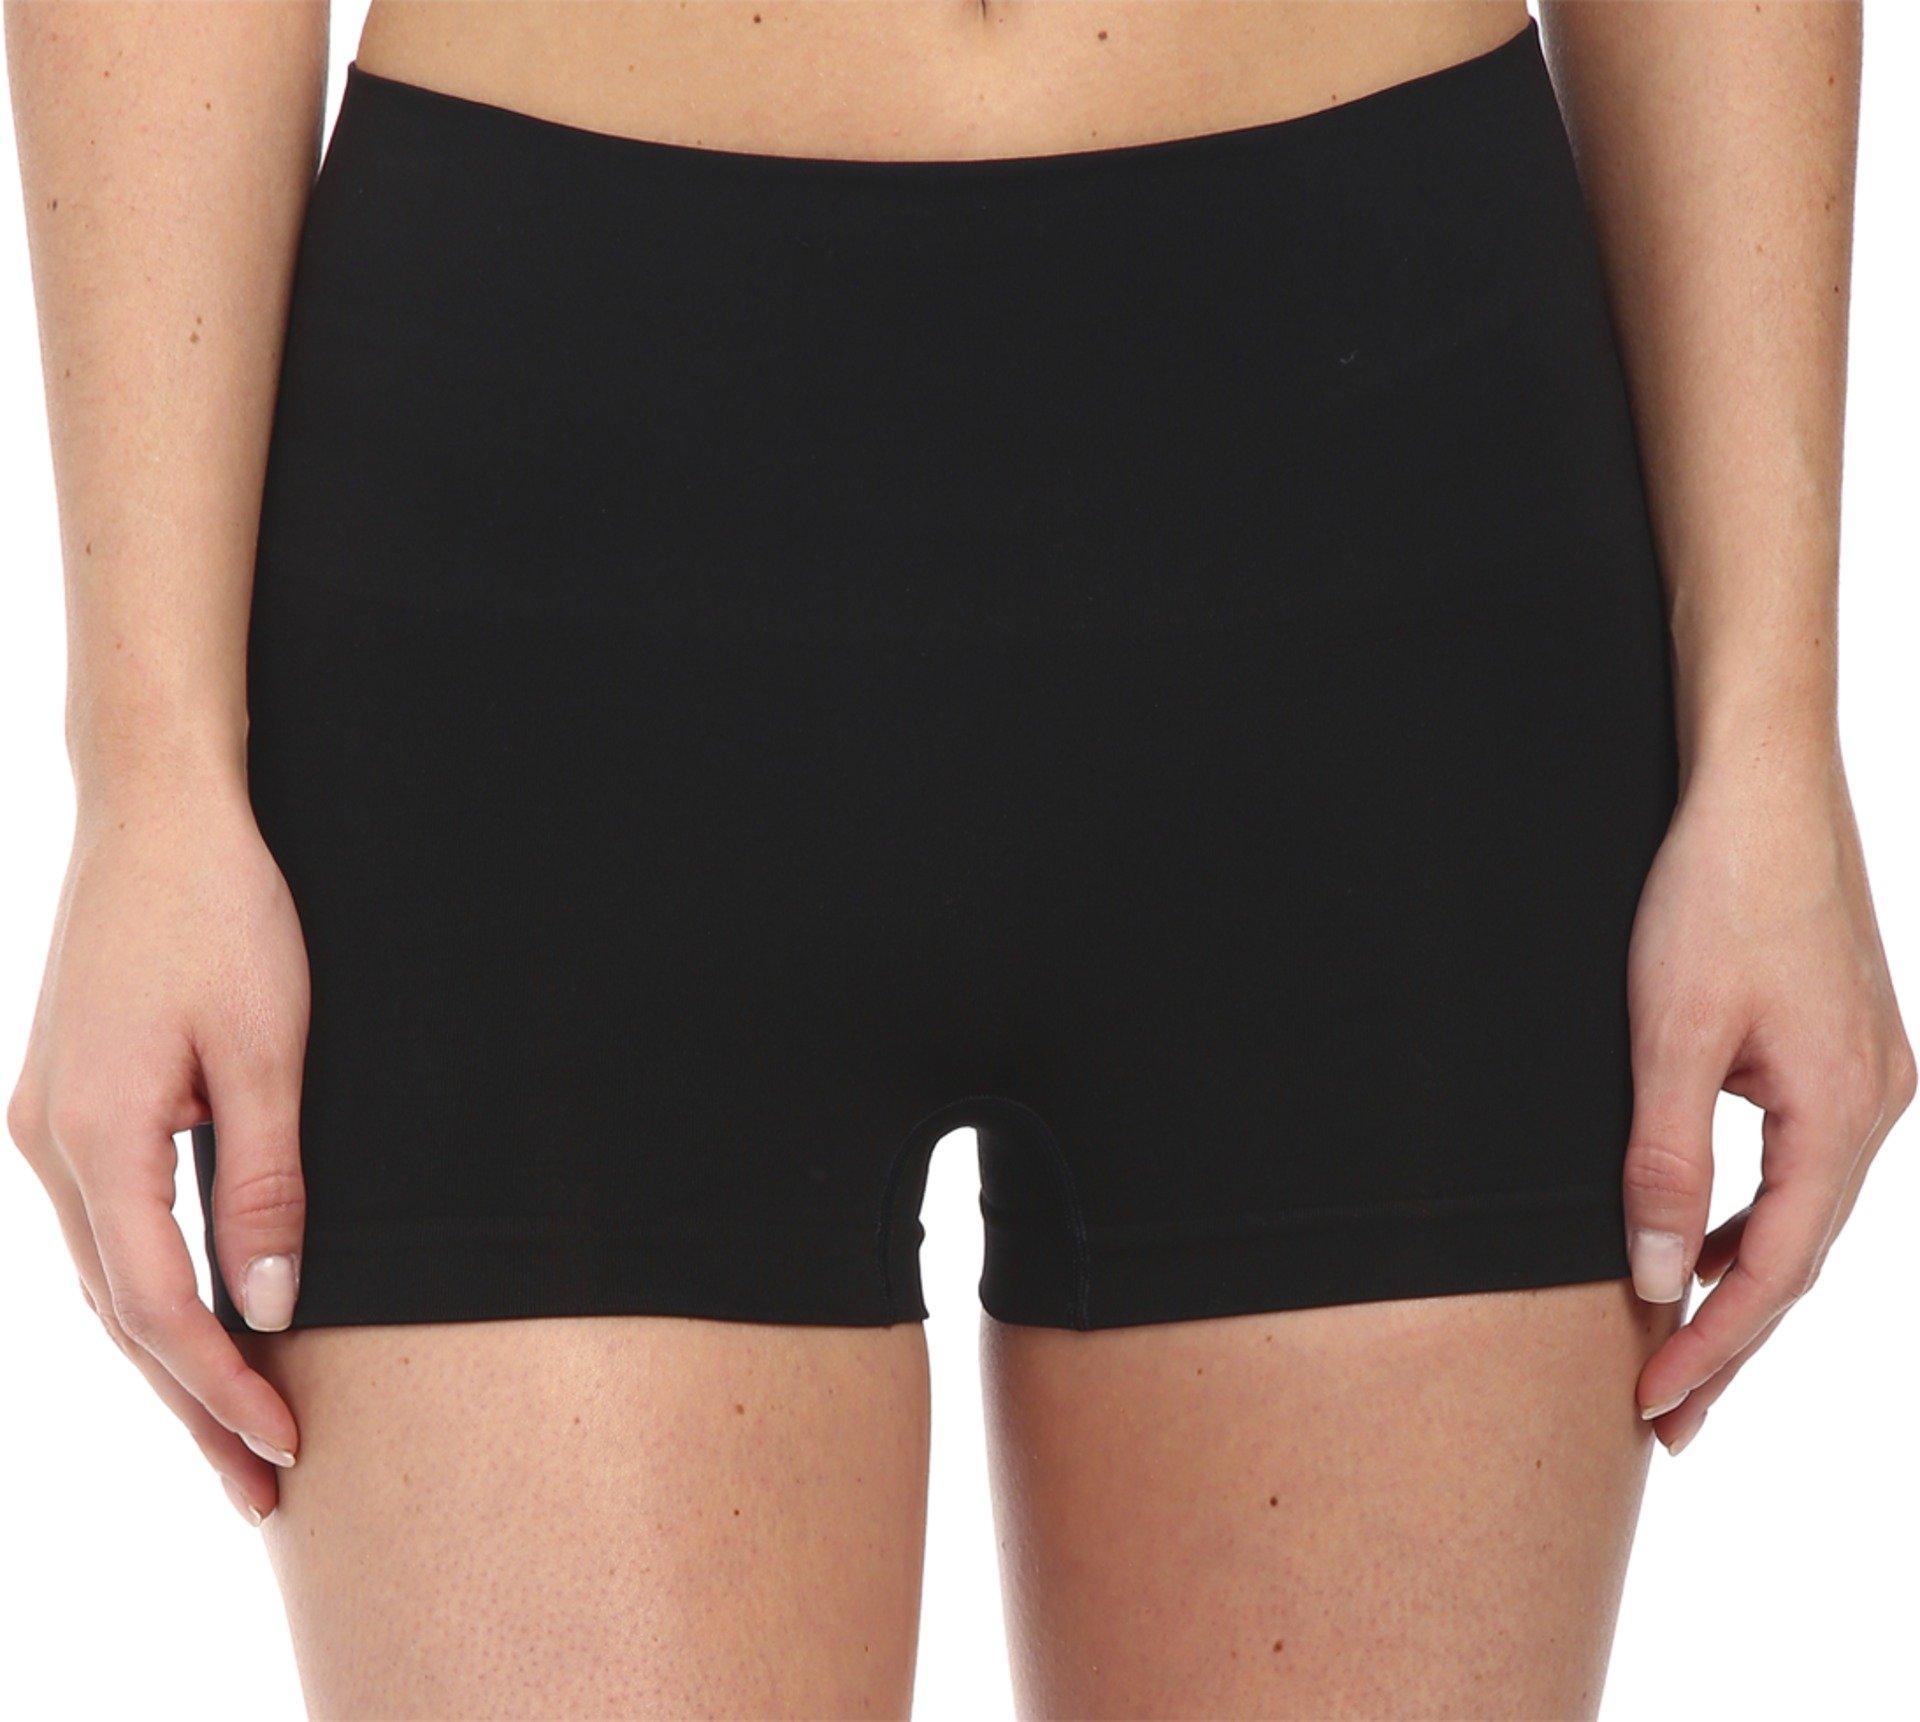 48baacd3fa Galleon - SPANX Women's Everyday Shaping Panties Seamless Boyshort Black Boy  Shorts LG